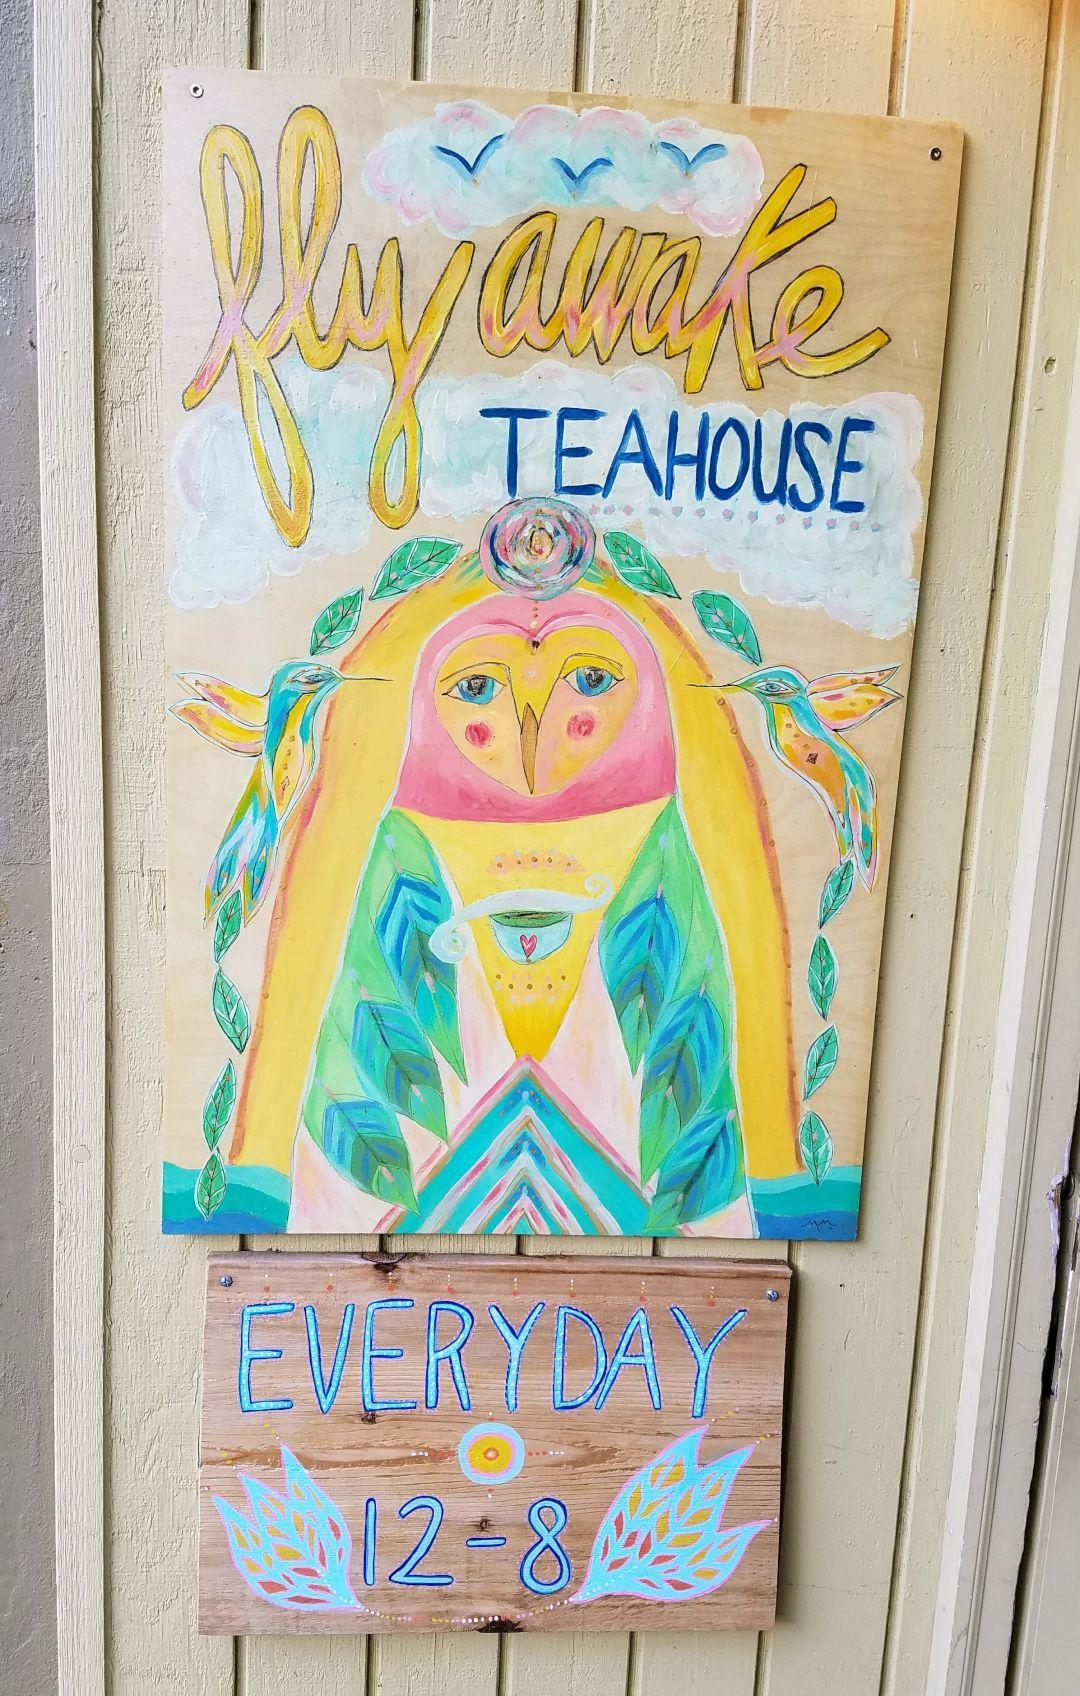 Fly awake teahouse humuyc